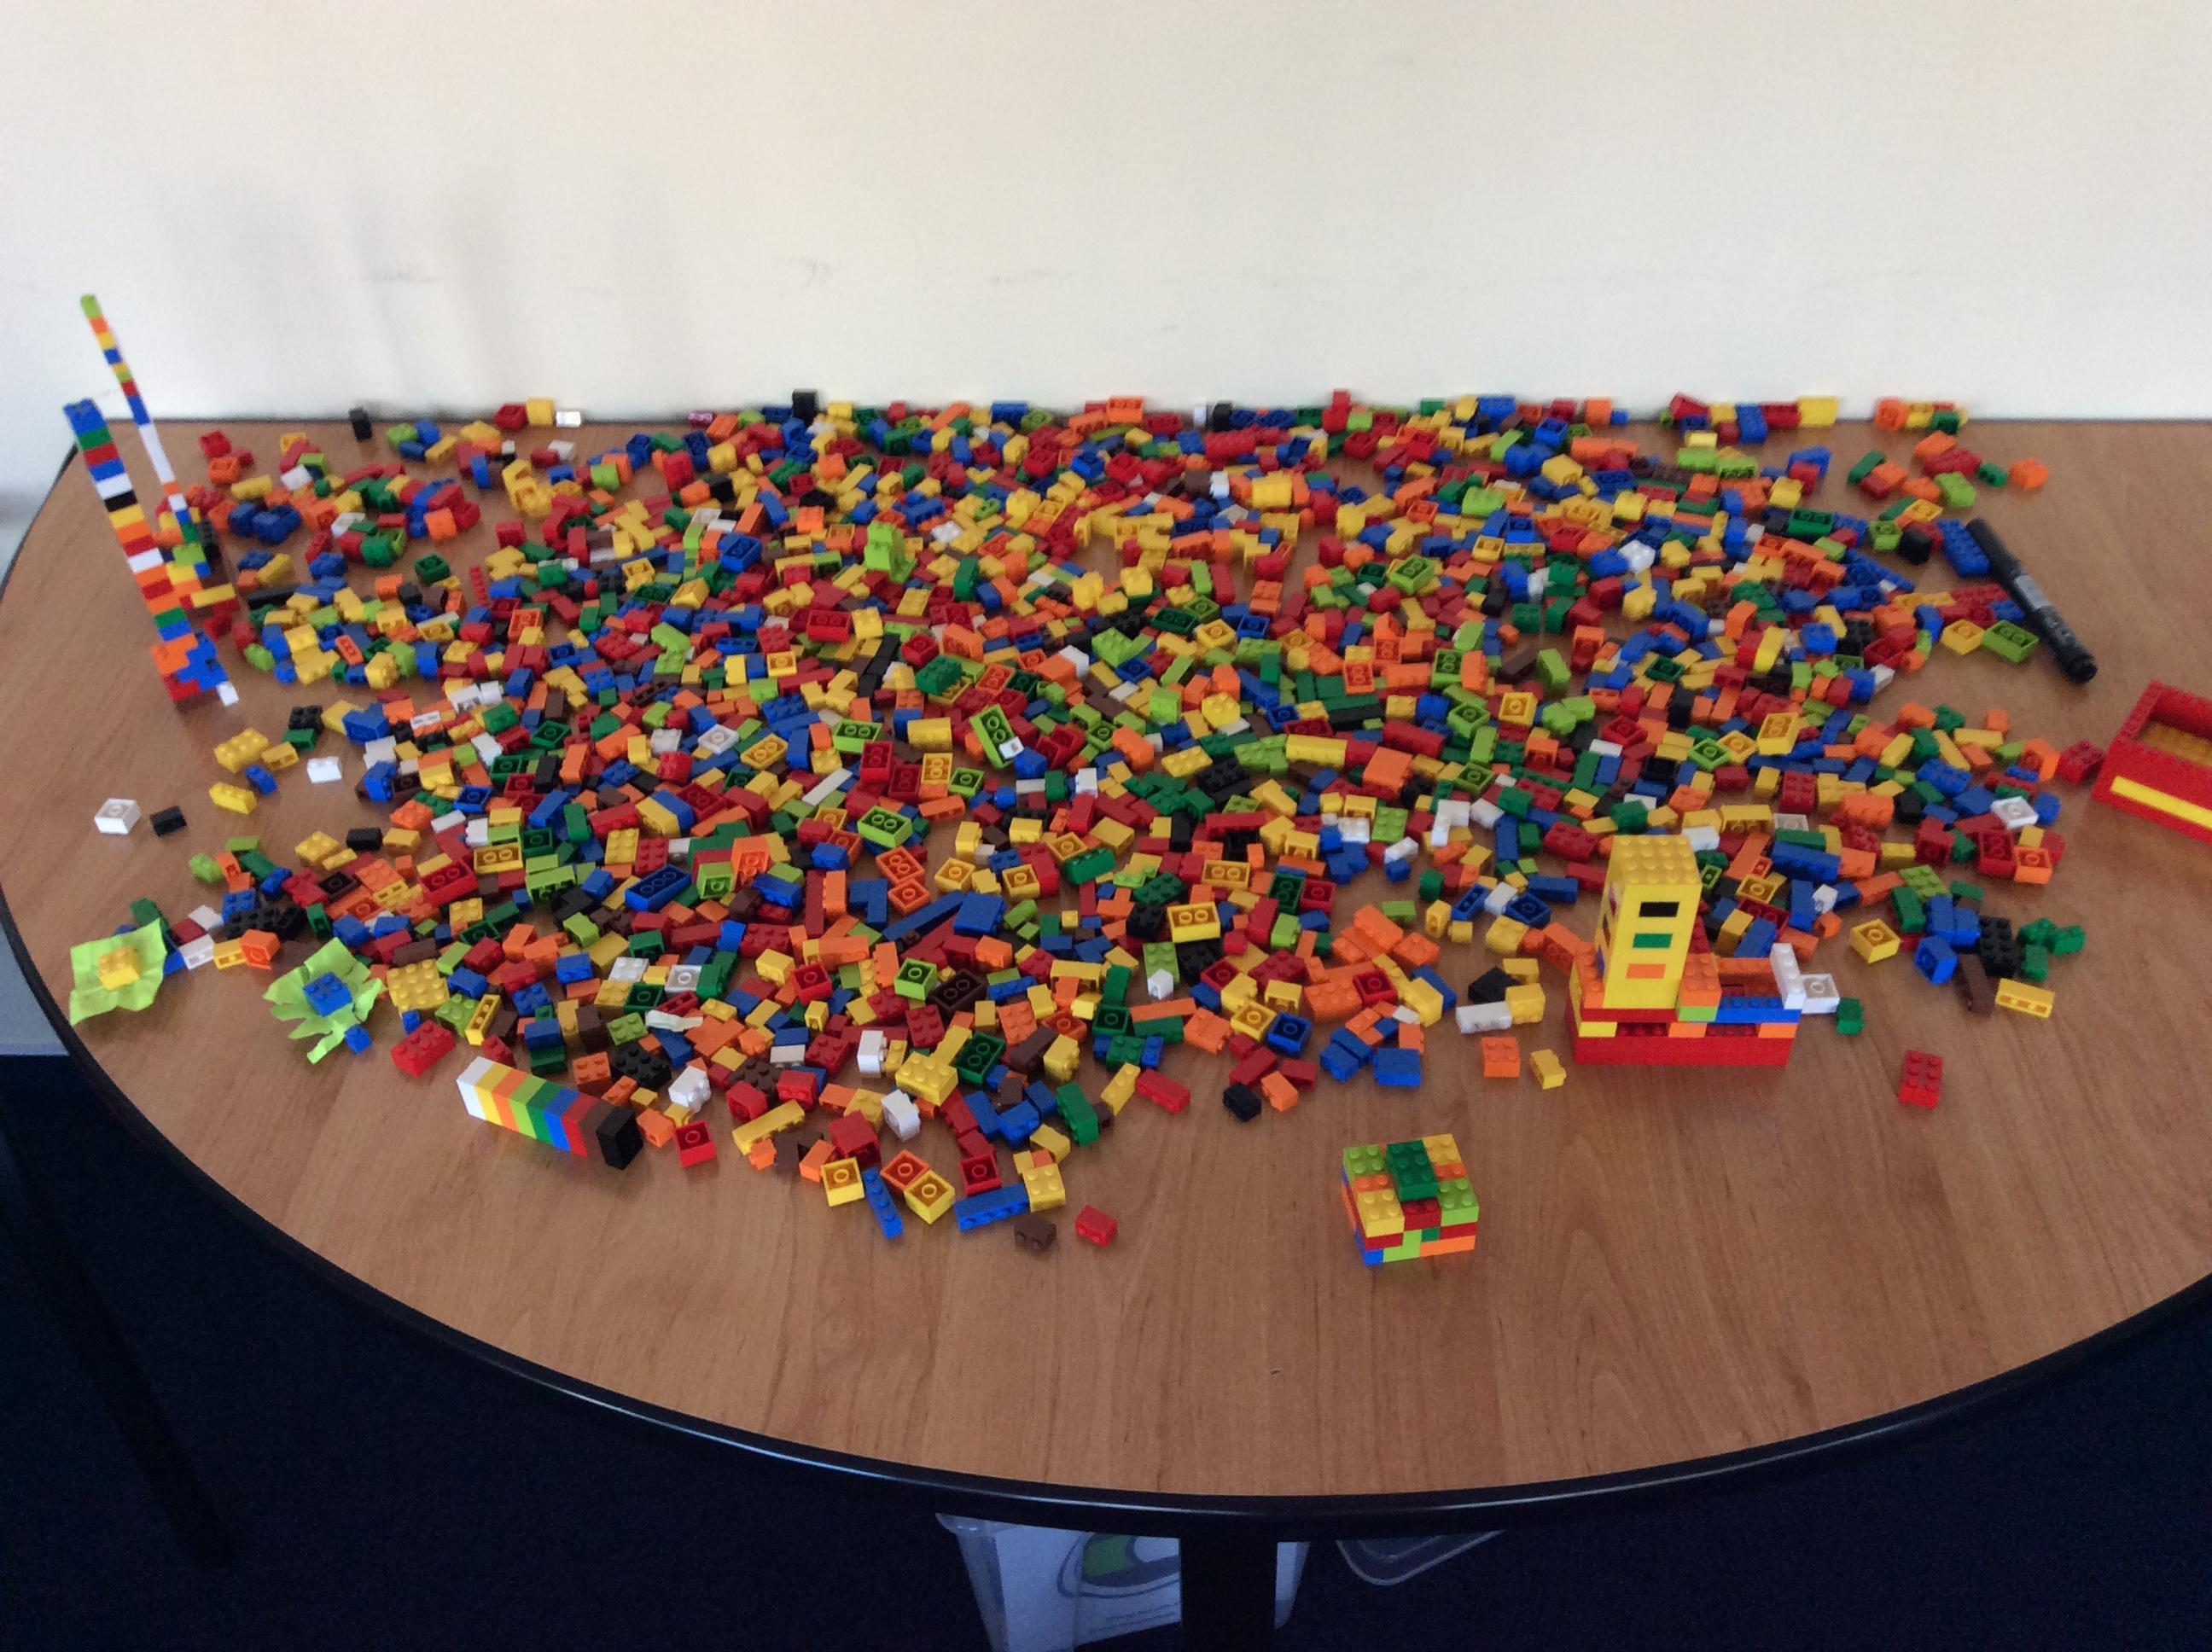 trening agile lego mesto